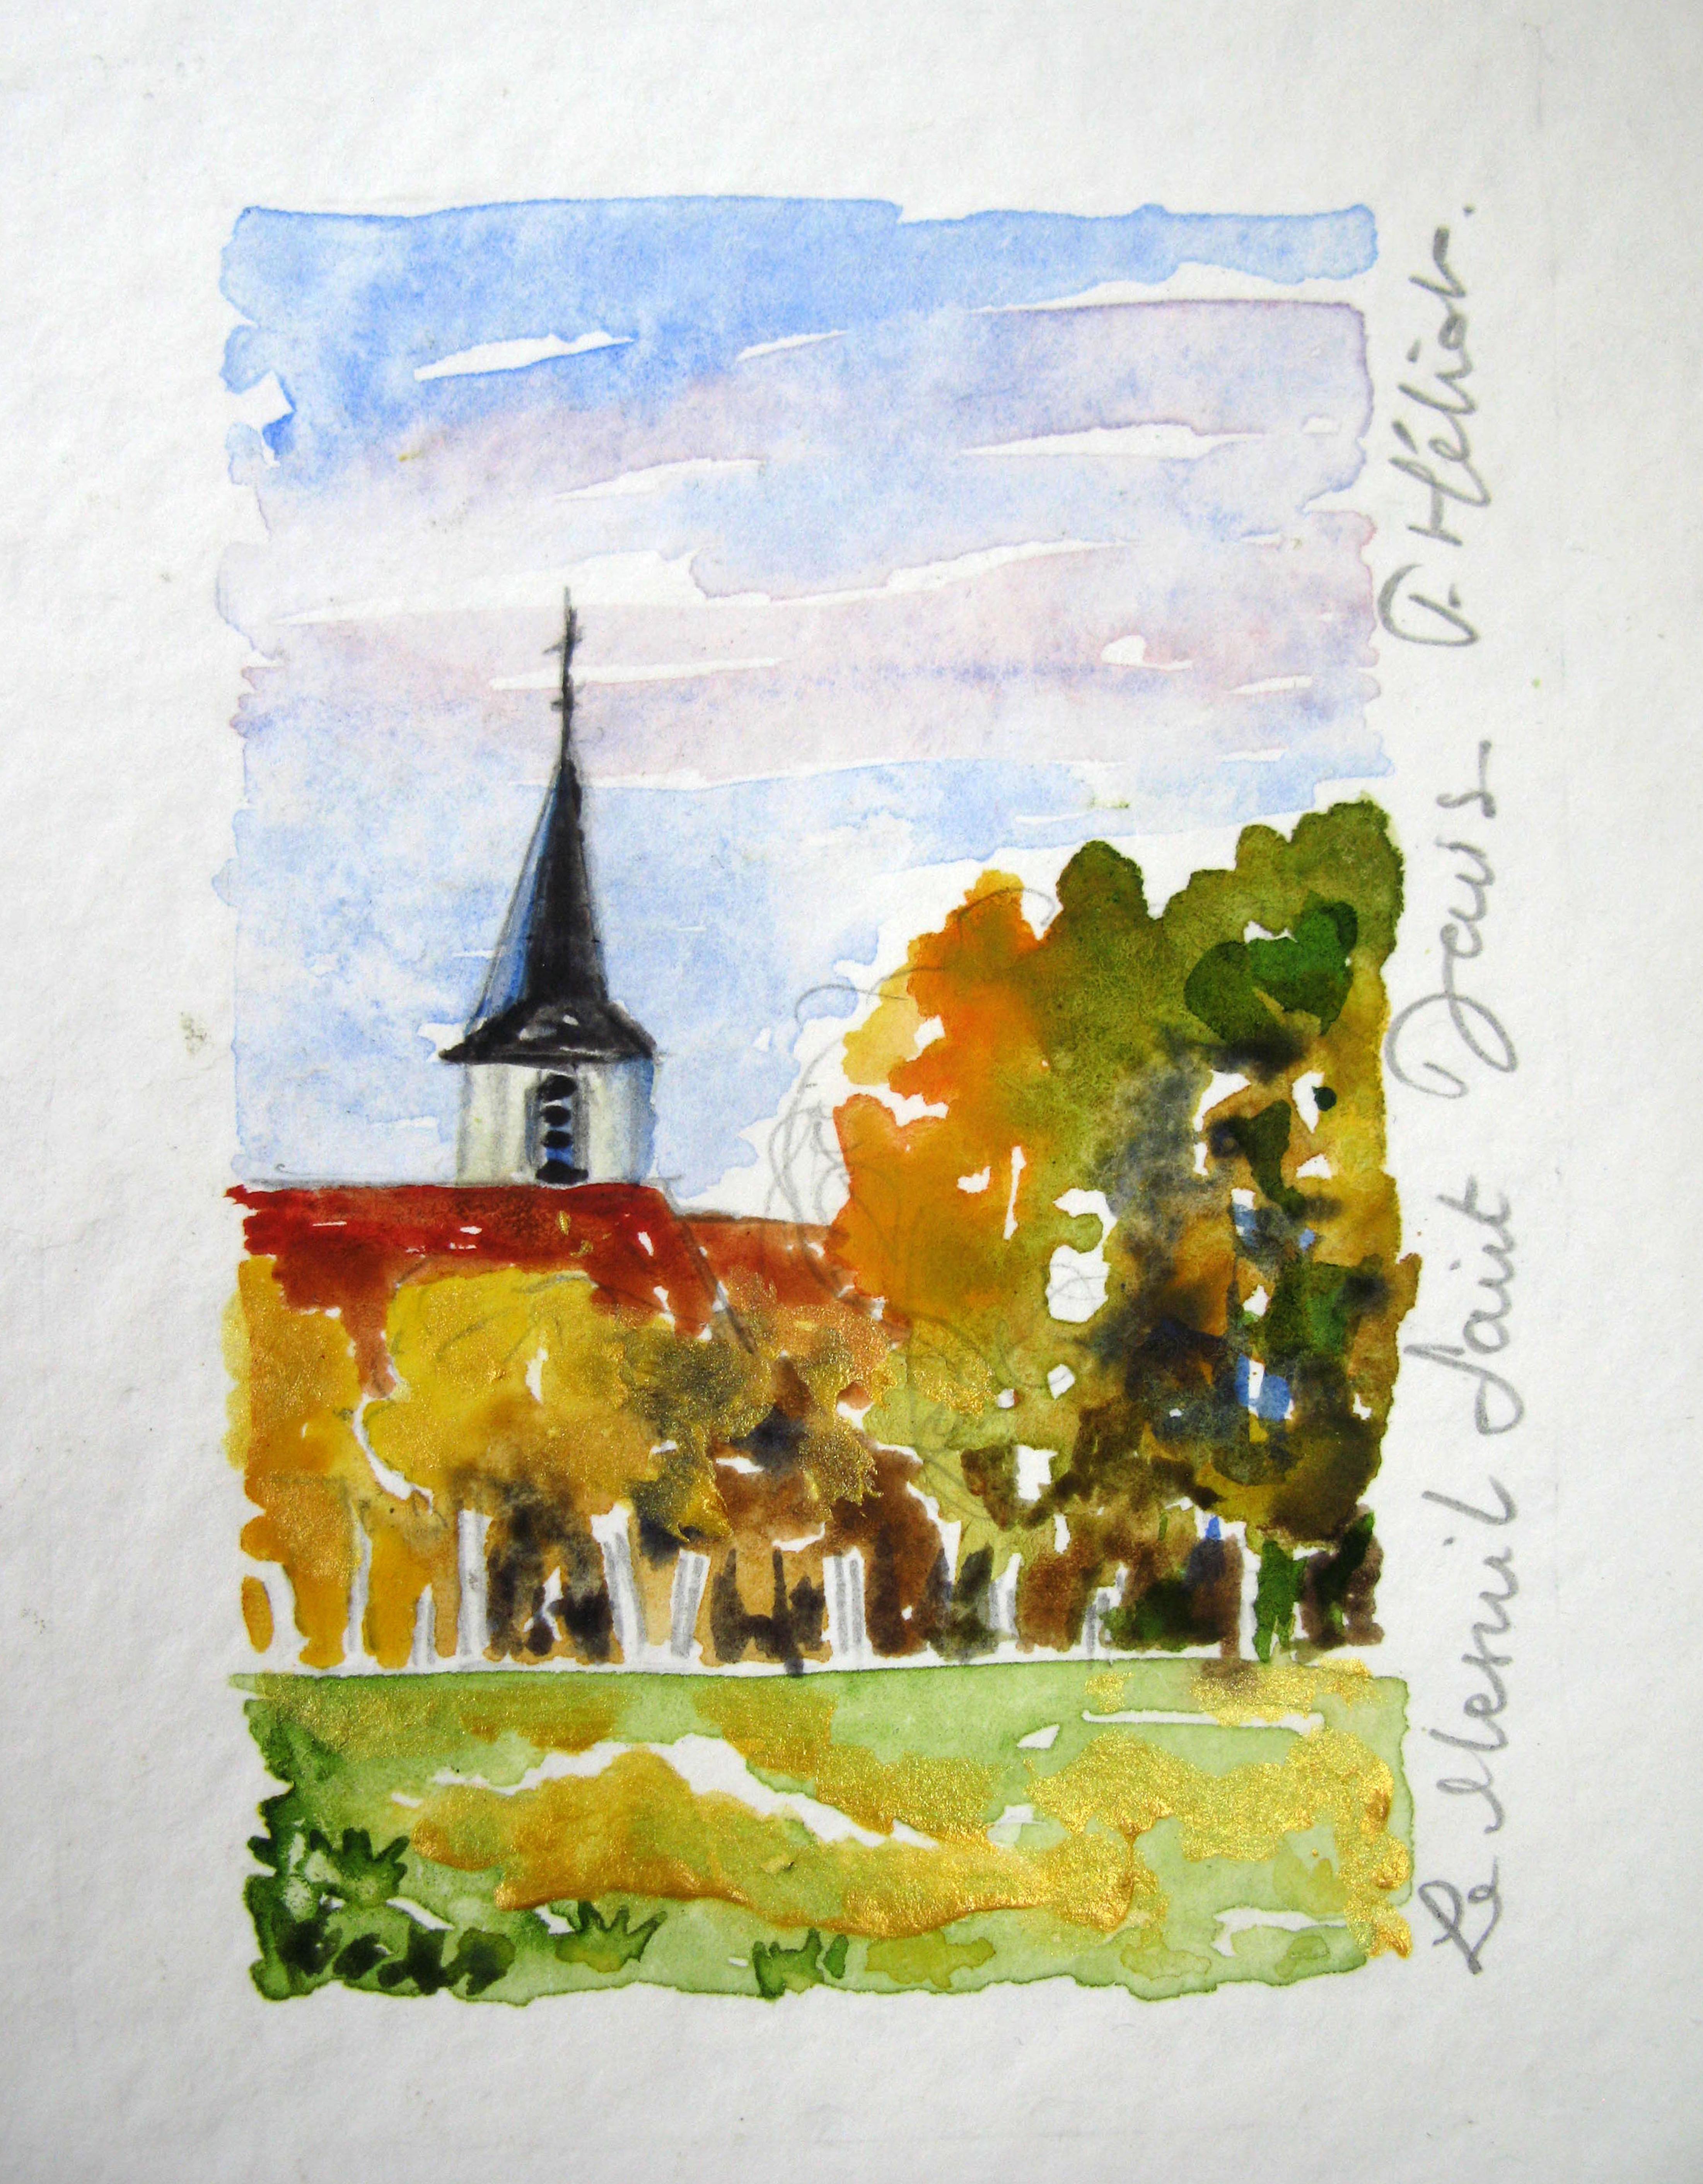 Le-Mesnil